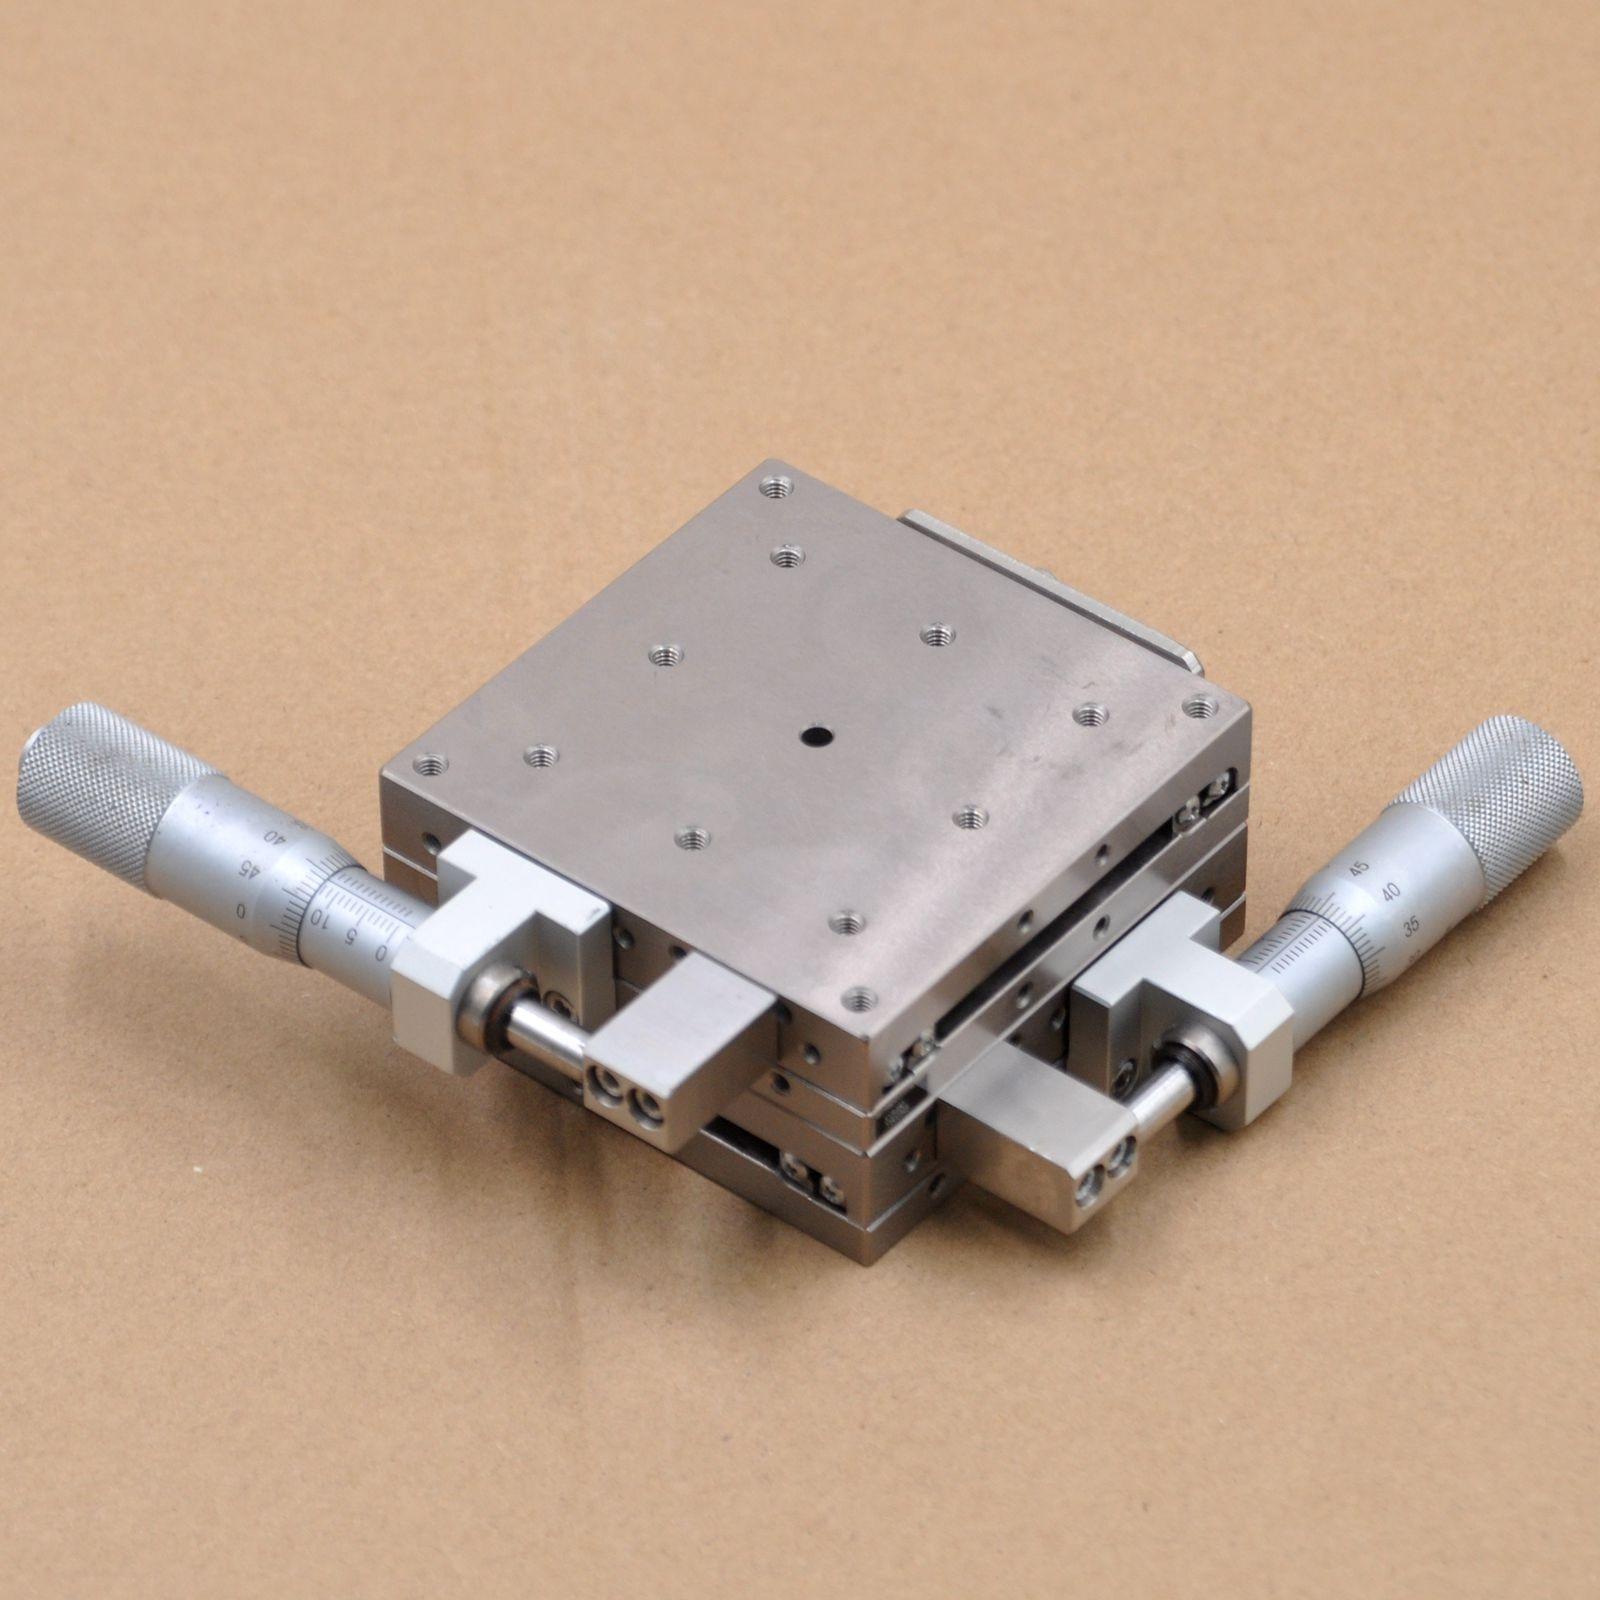 XY axis Misumi XYSG80 optical manual mobile platform high precision linear ball guide rail sliding table steel 80 * 80mm